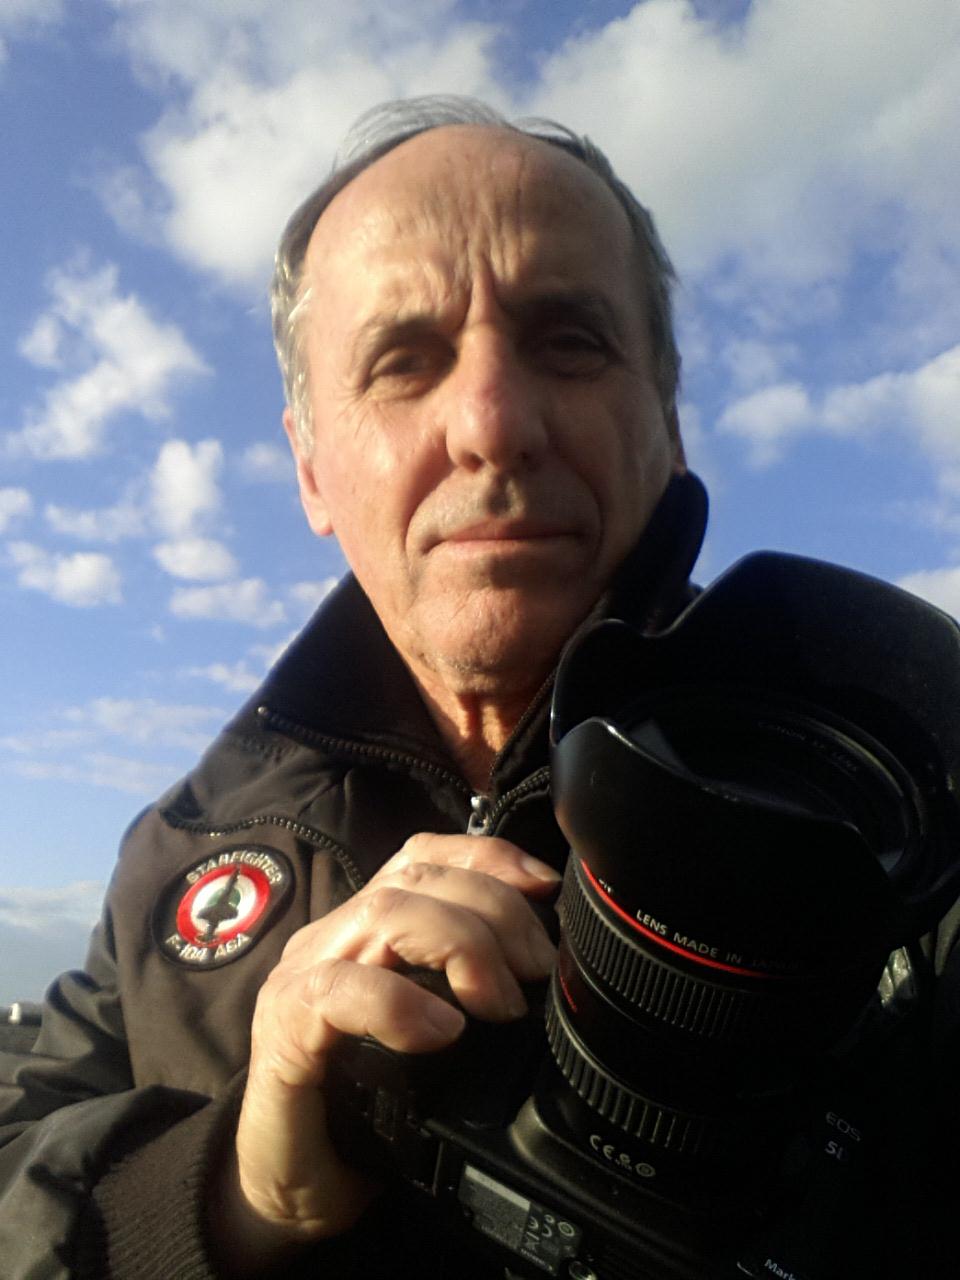 Marcello Massalin